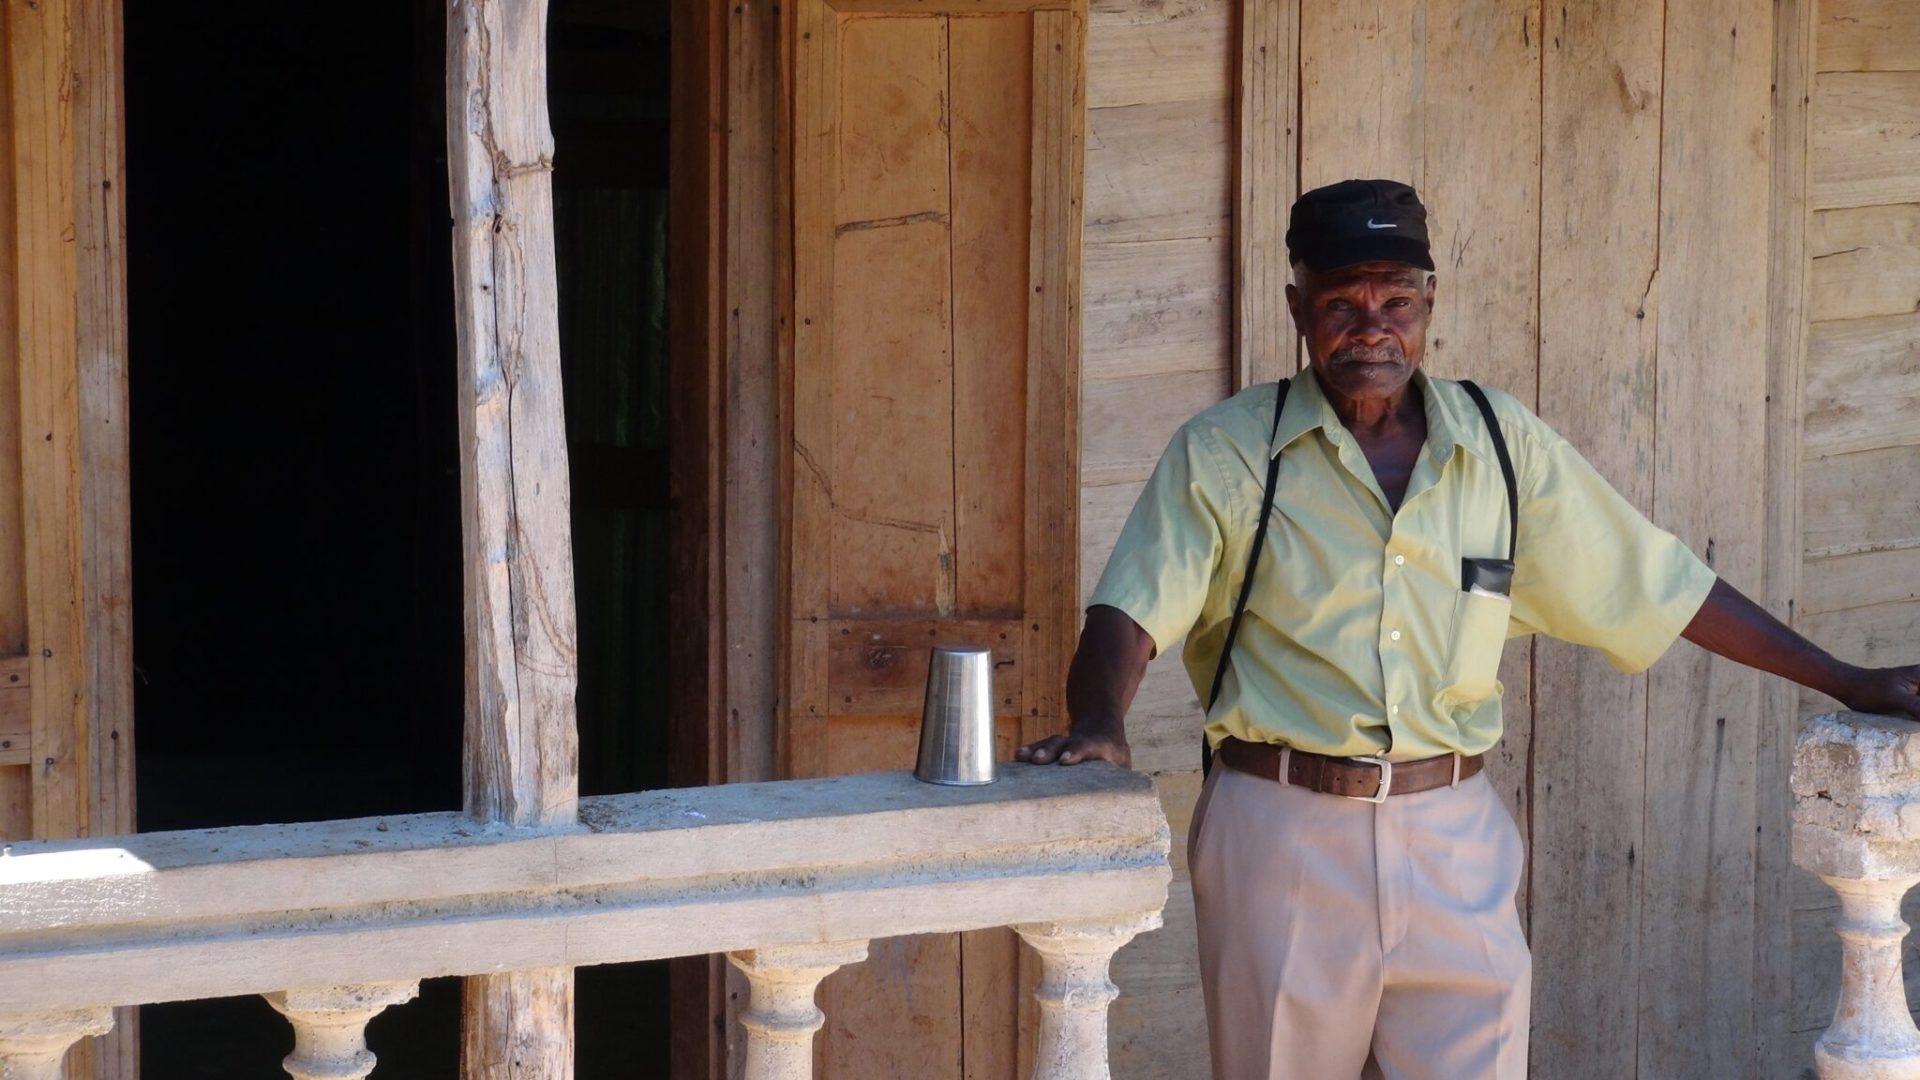 Desire works in Haiti